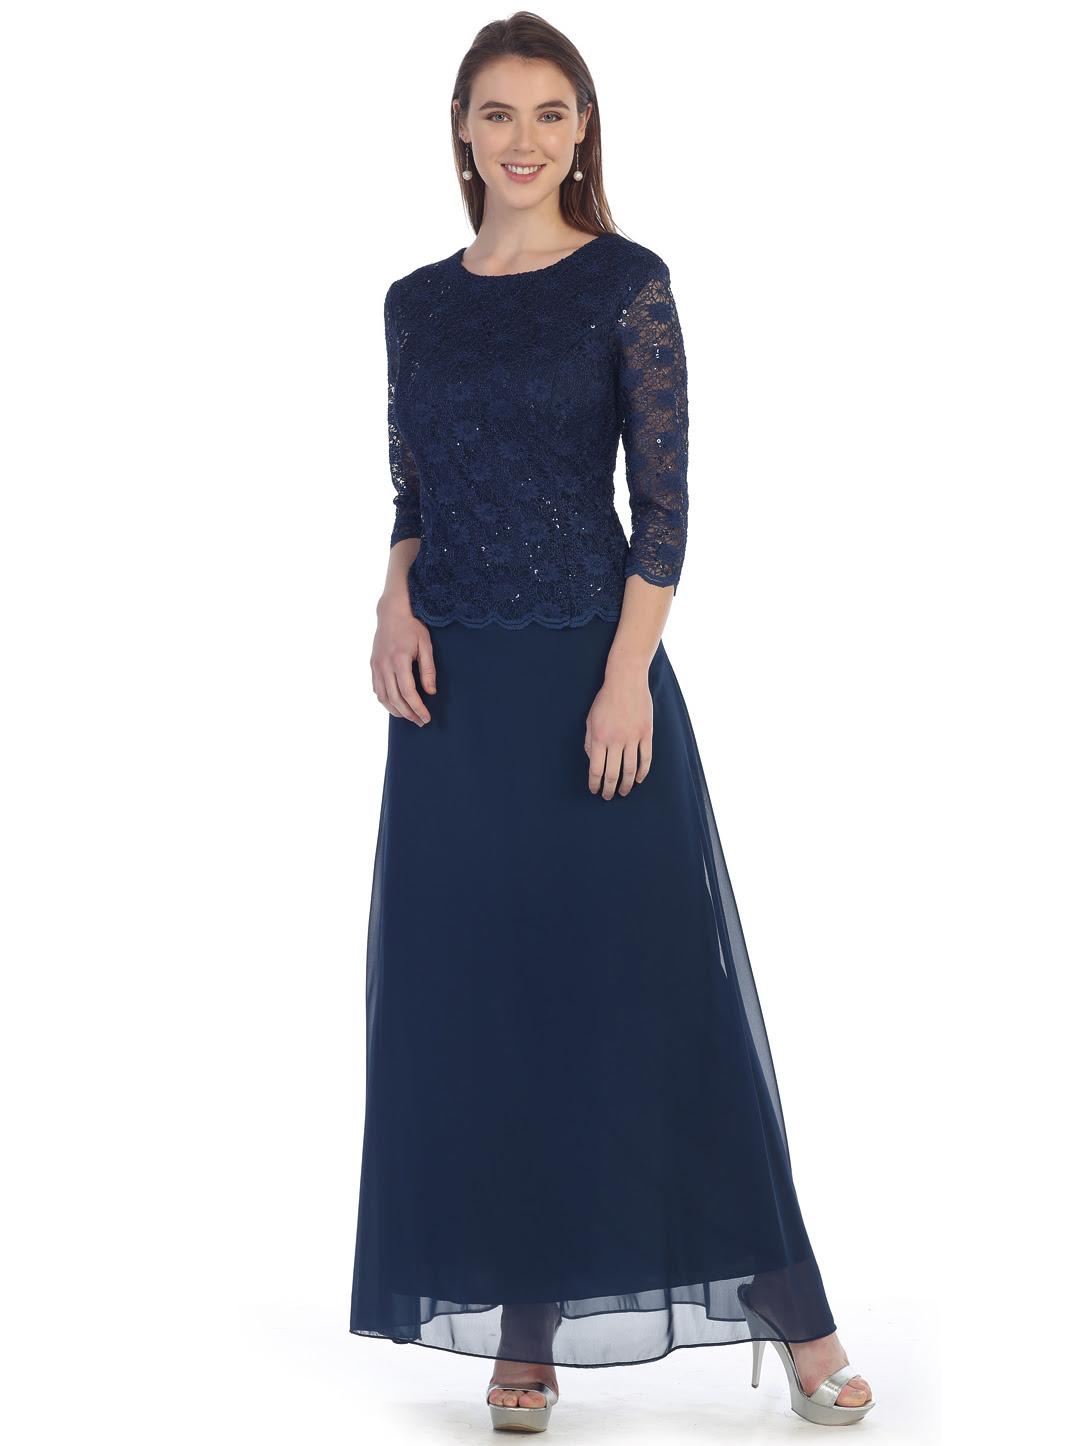 Chiffon overlay three quarter sleeve dress online